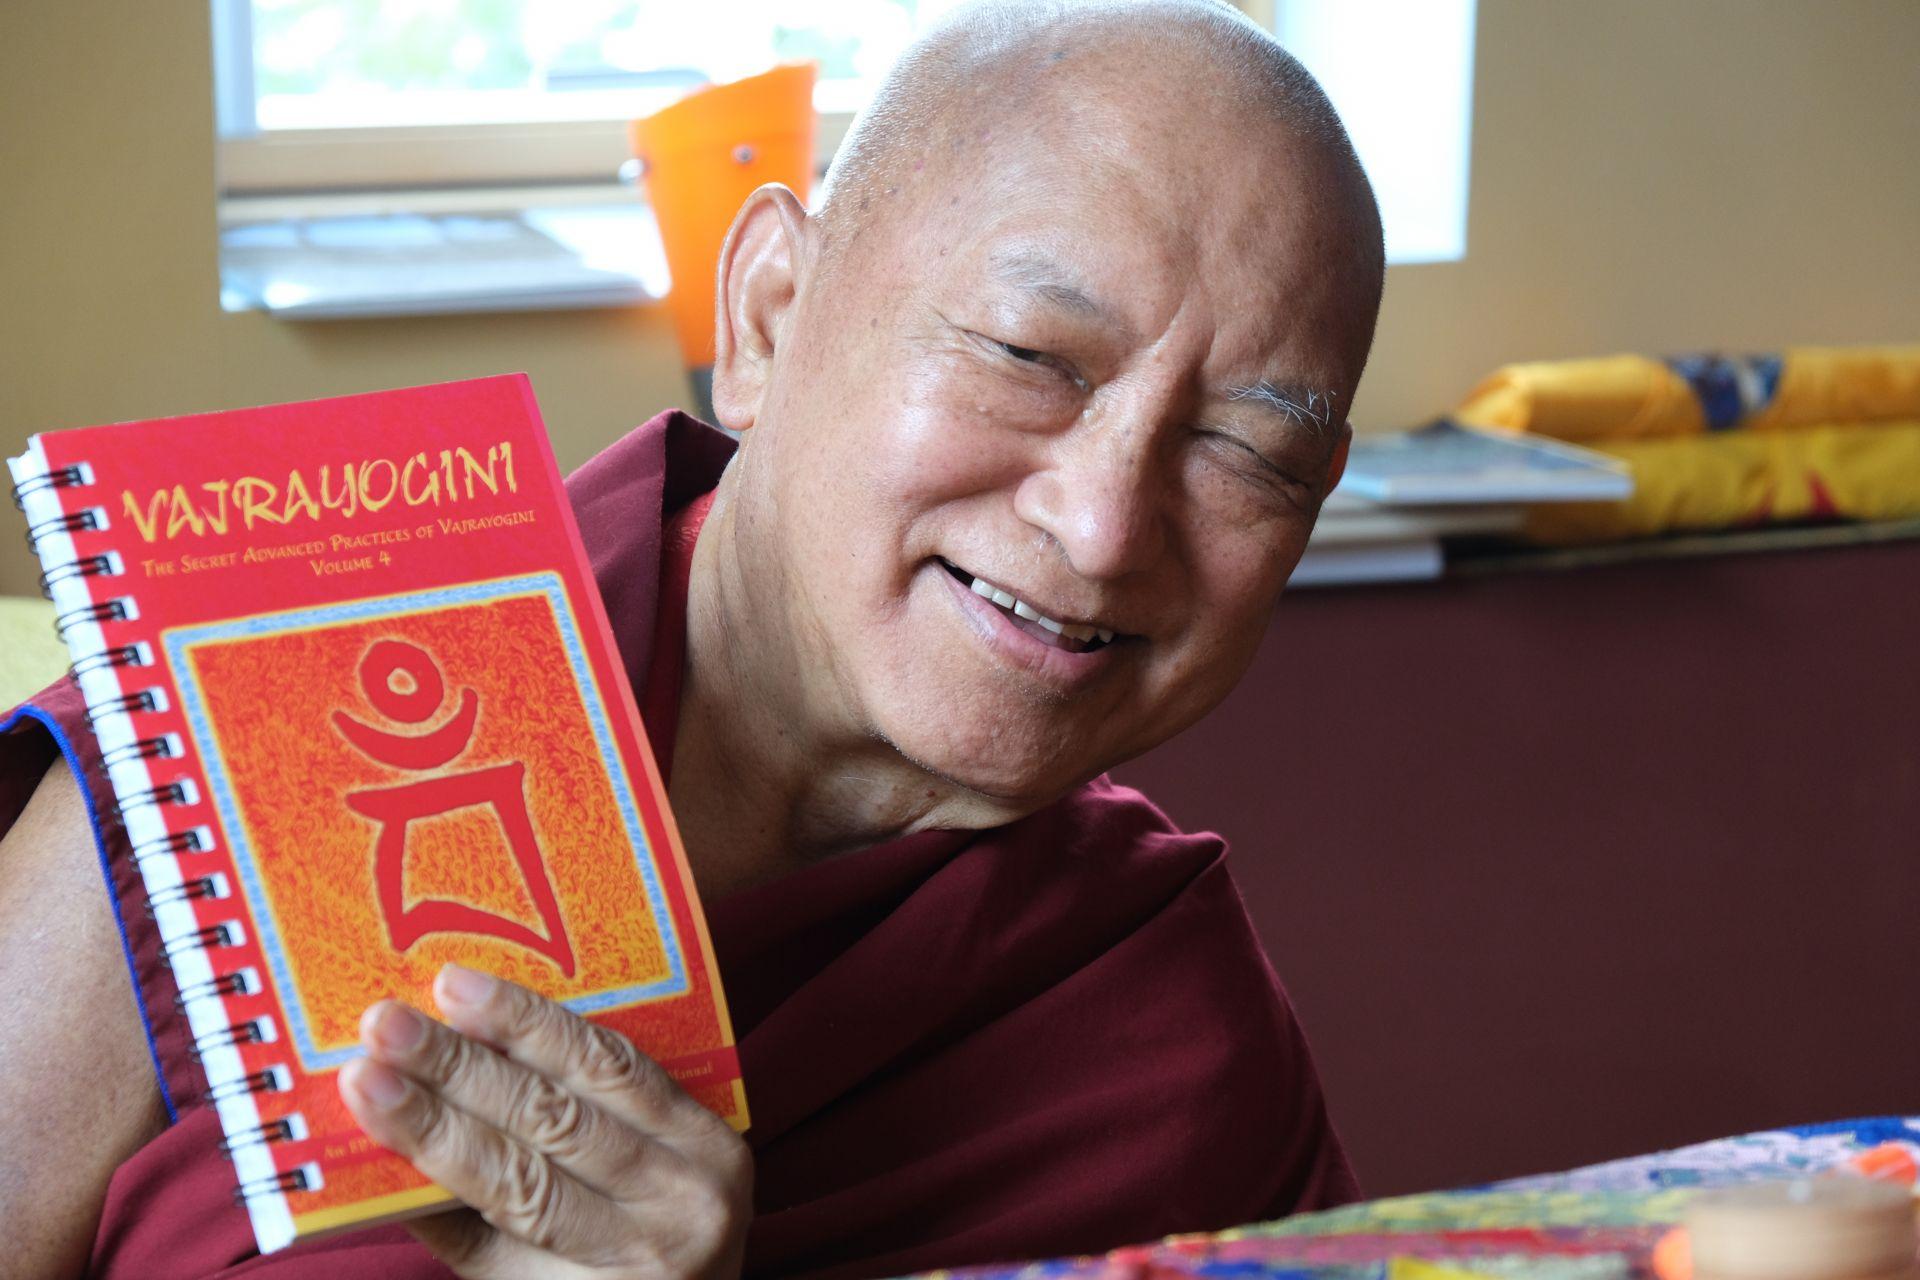 The Secret Advanced Practices of Vajrayogini